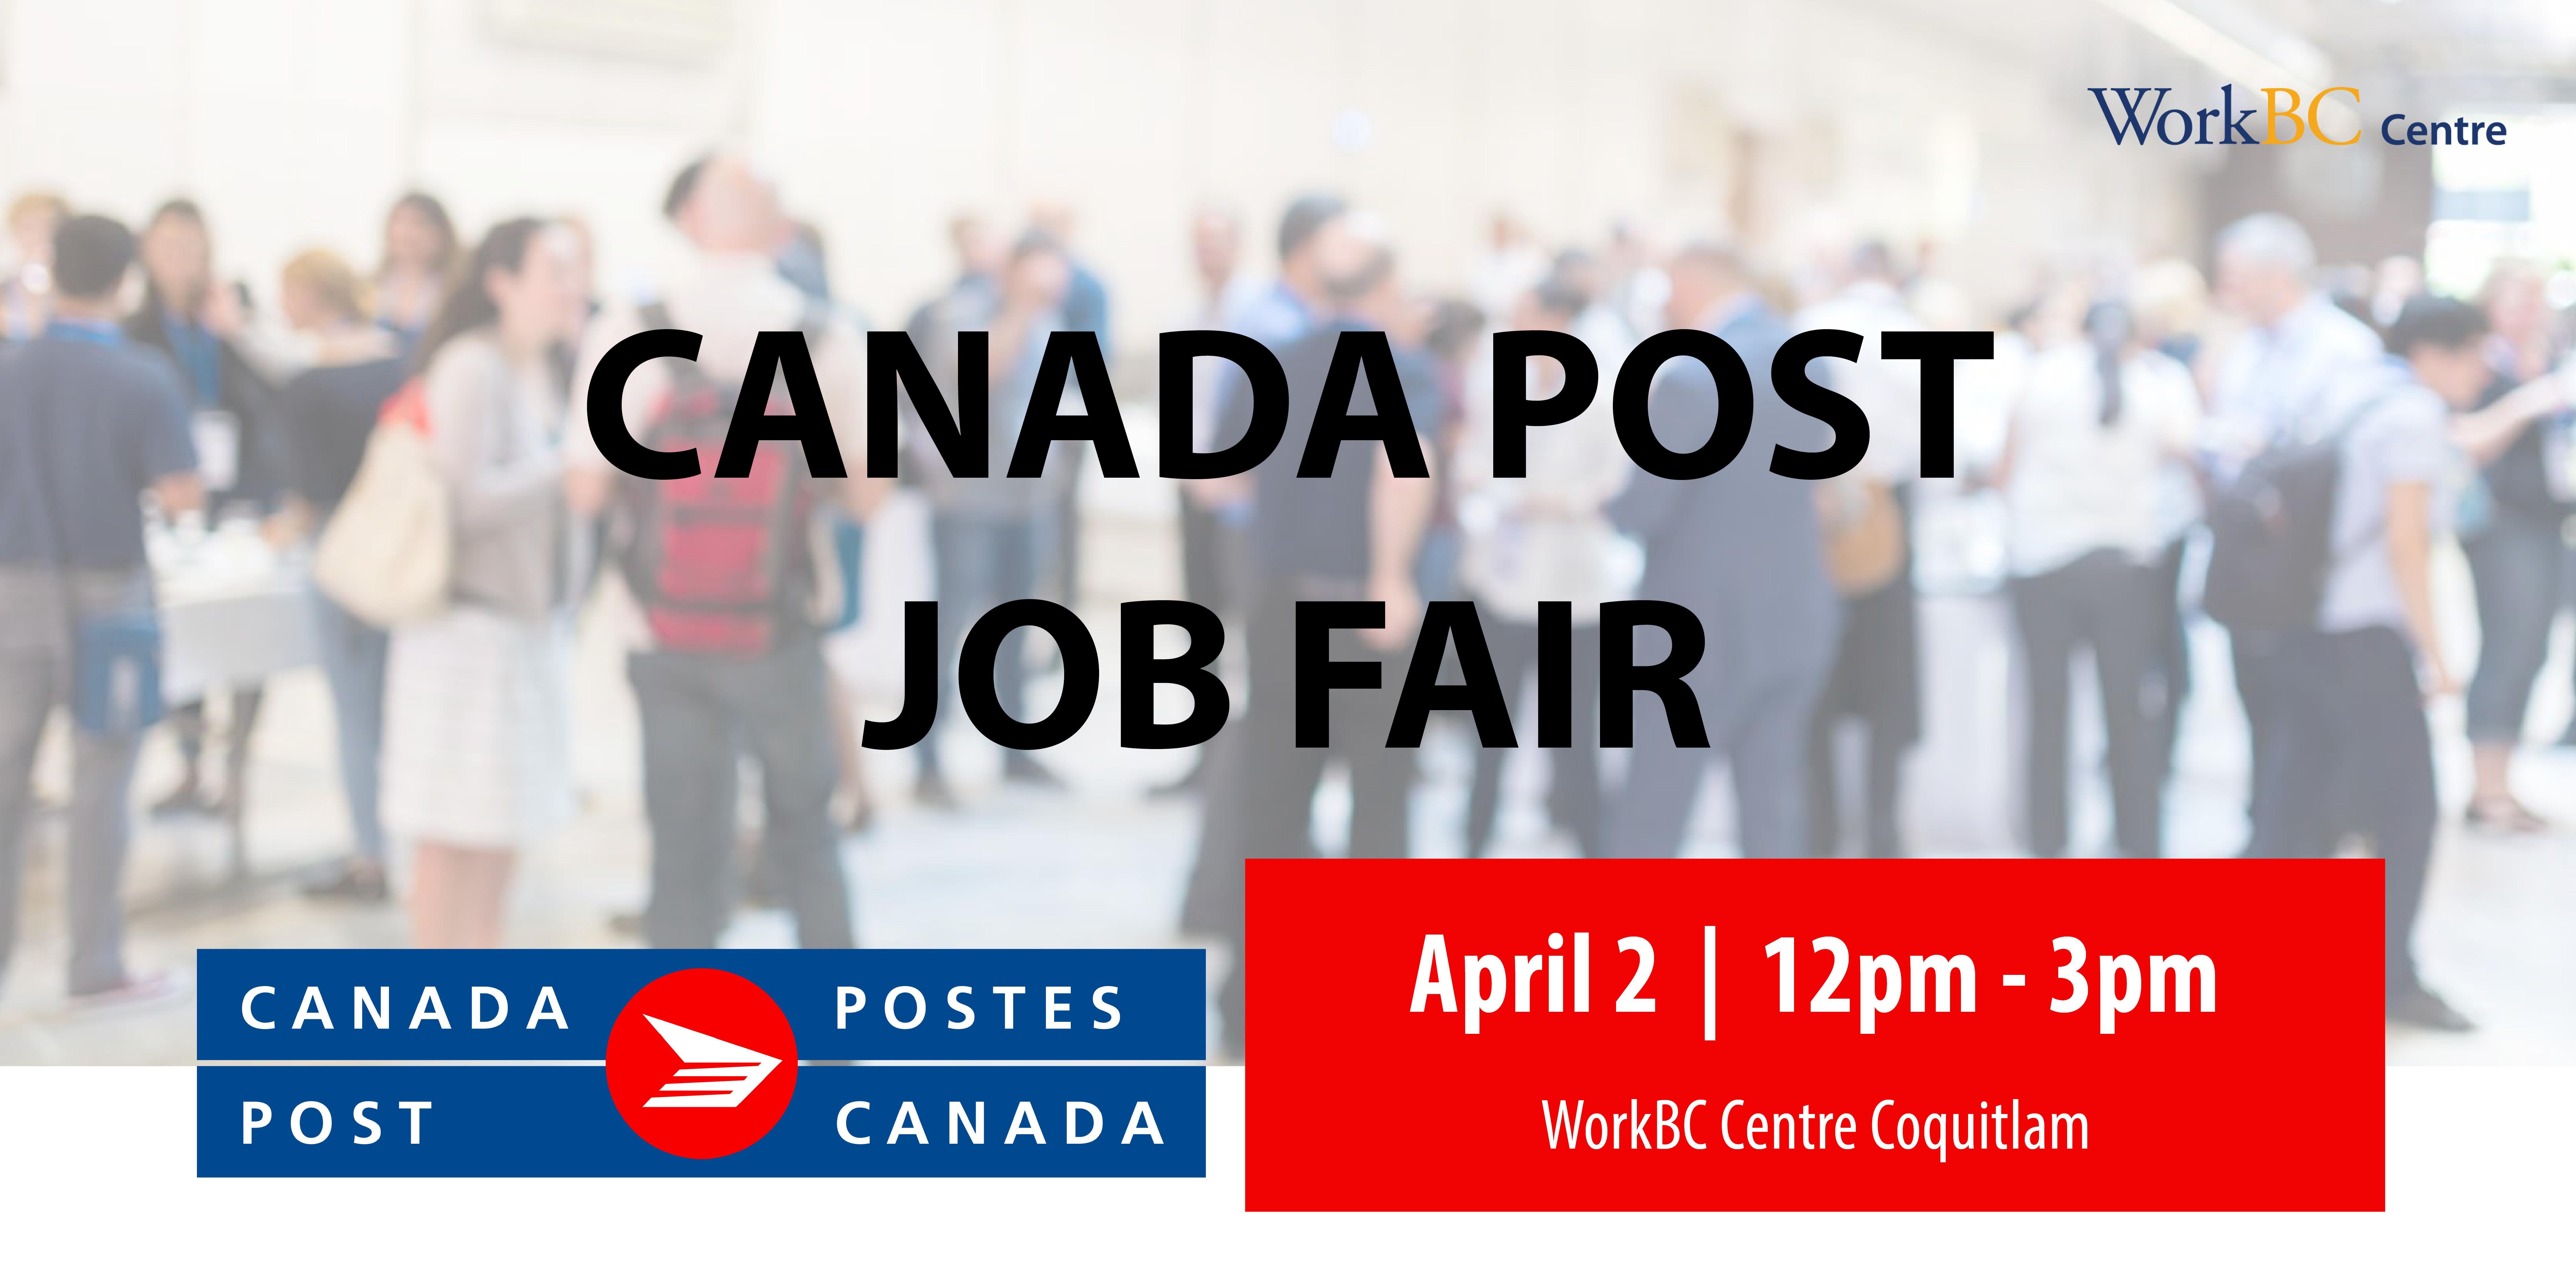 Canada Post Job Fair - Presented by WorkBC Centre Coquitlam